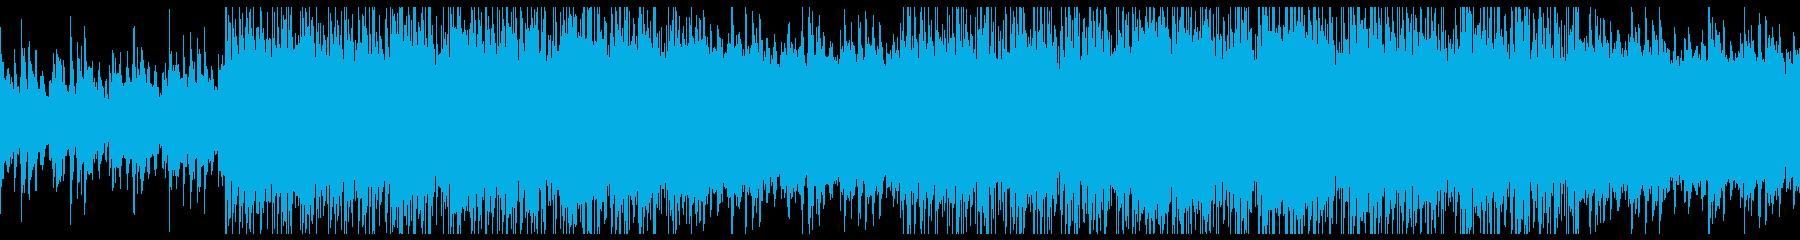 saxの美しい lofi chillの再生済みの波形